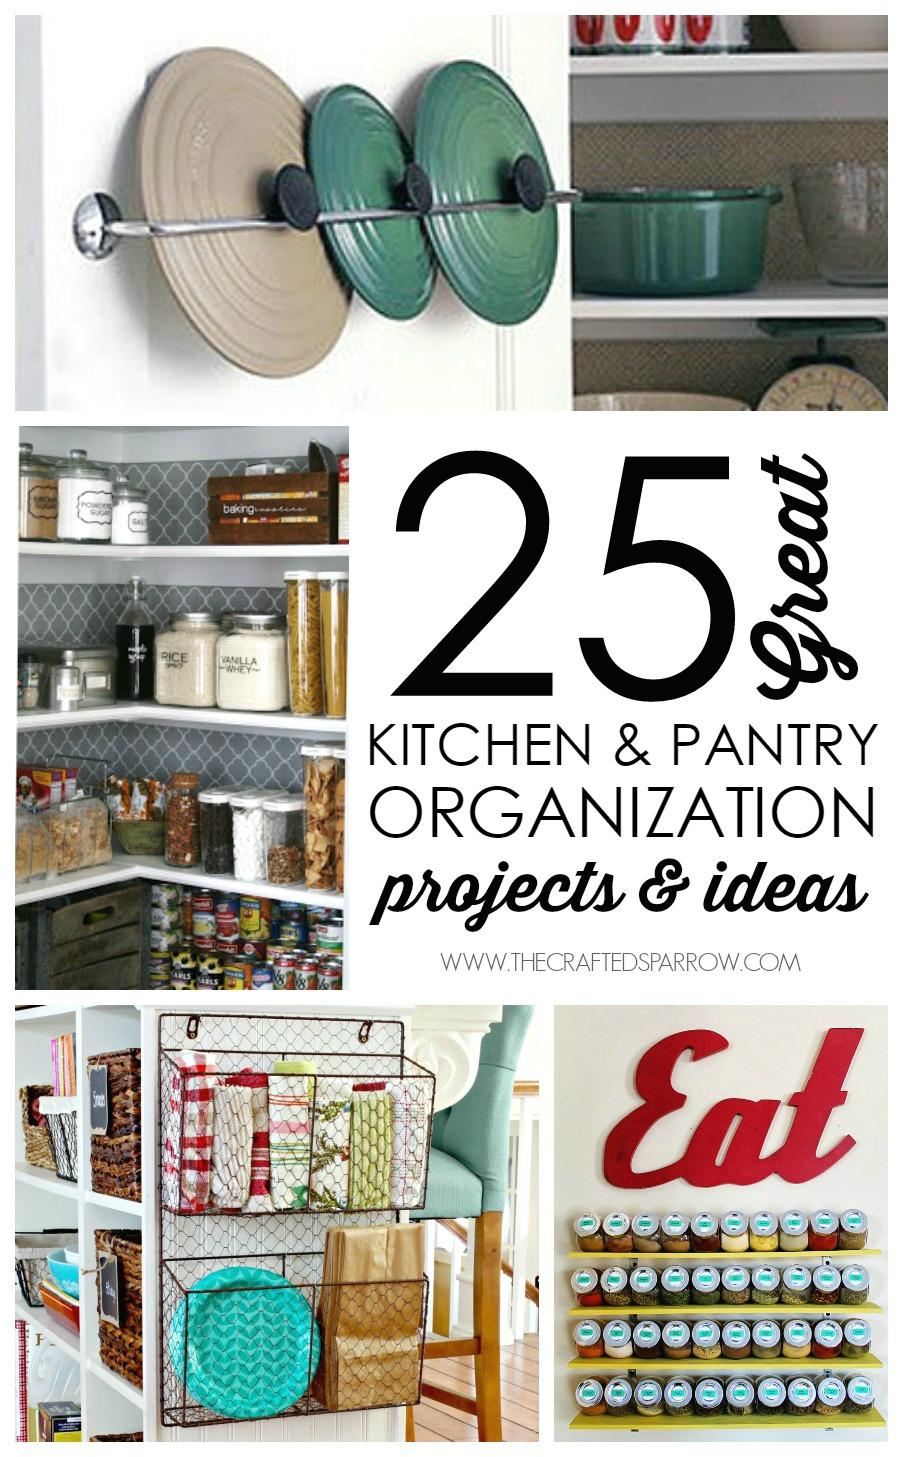 kitchen pantry organization projects ideas laundry room storage ideas bathroom laundry room ideas